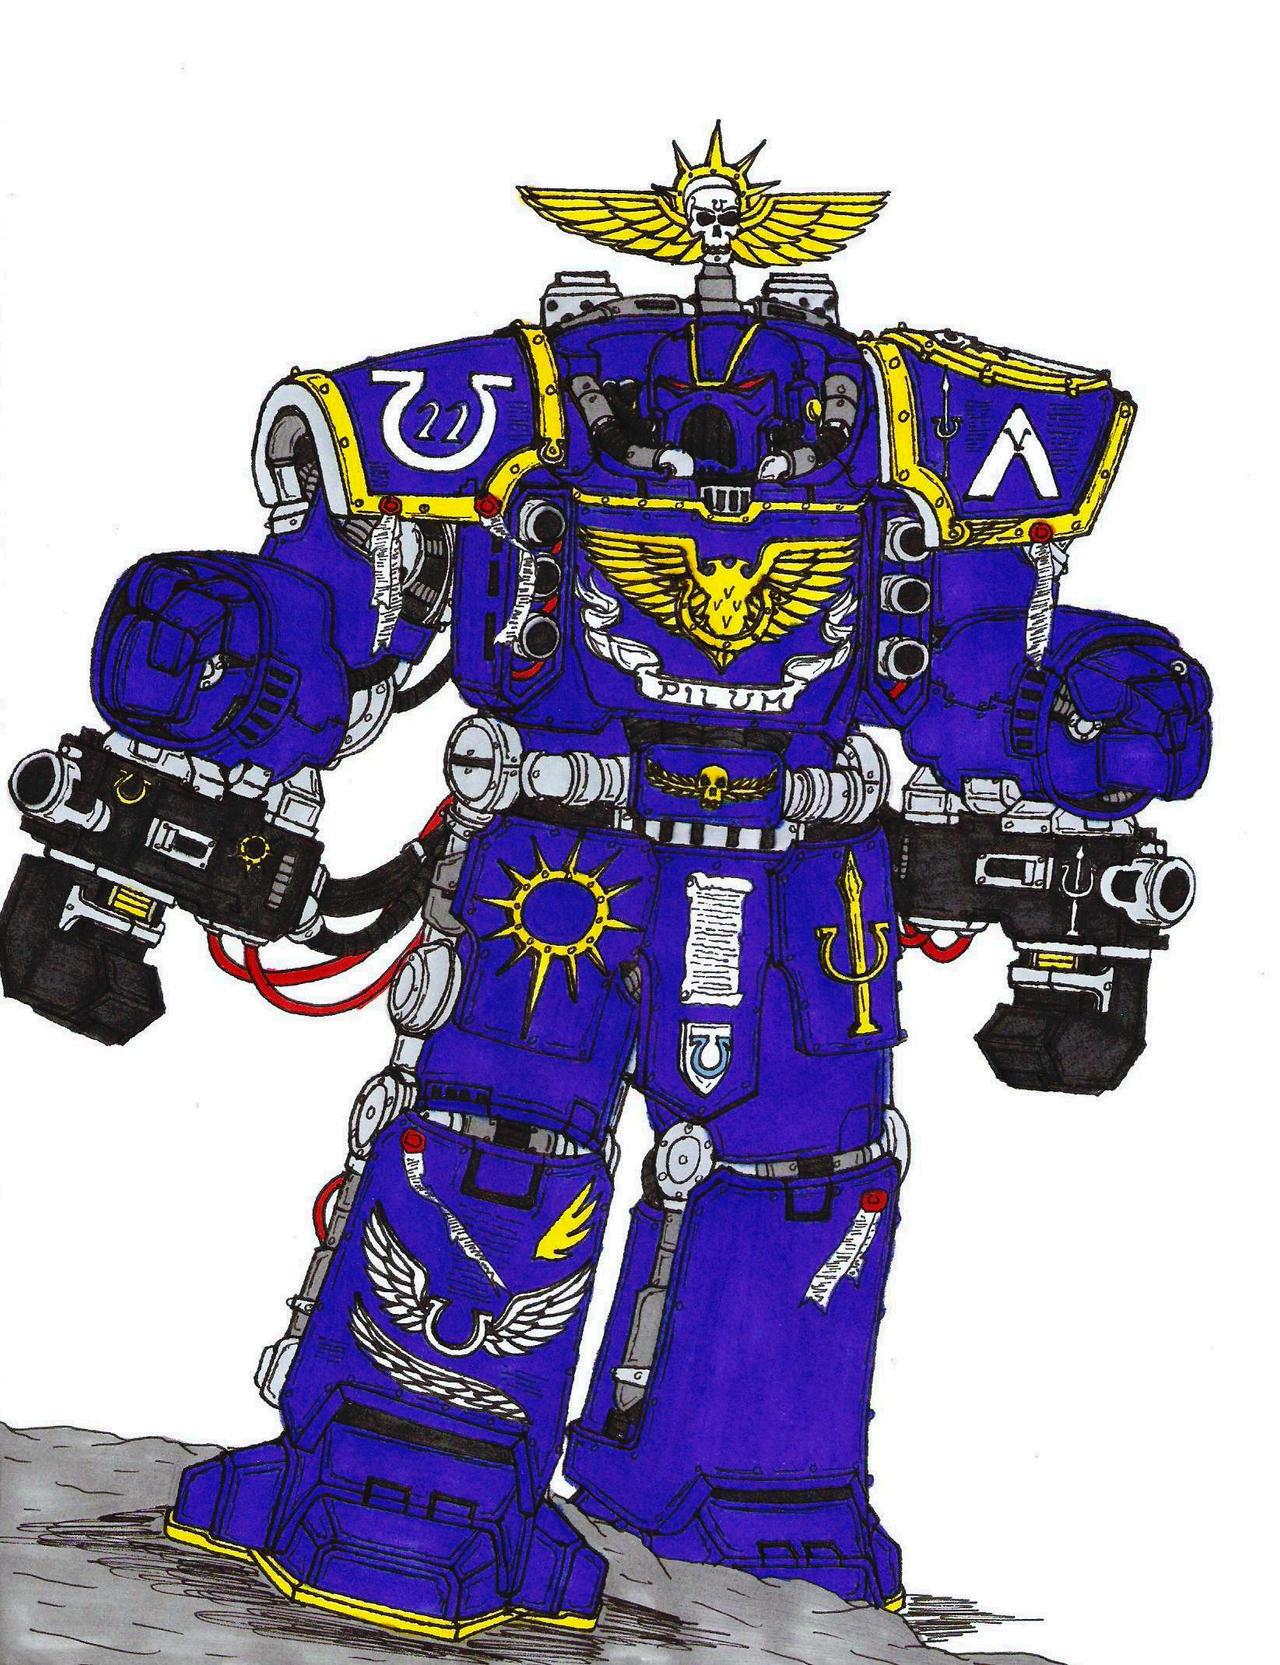 Centurion, 22nd Company Ultramarines by terraluna5